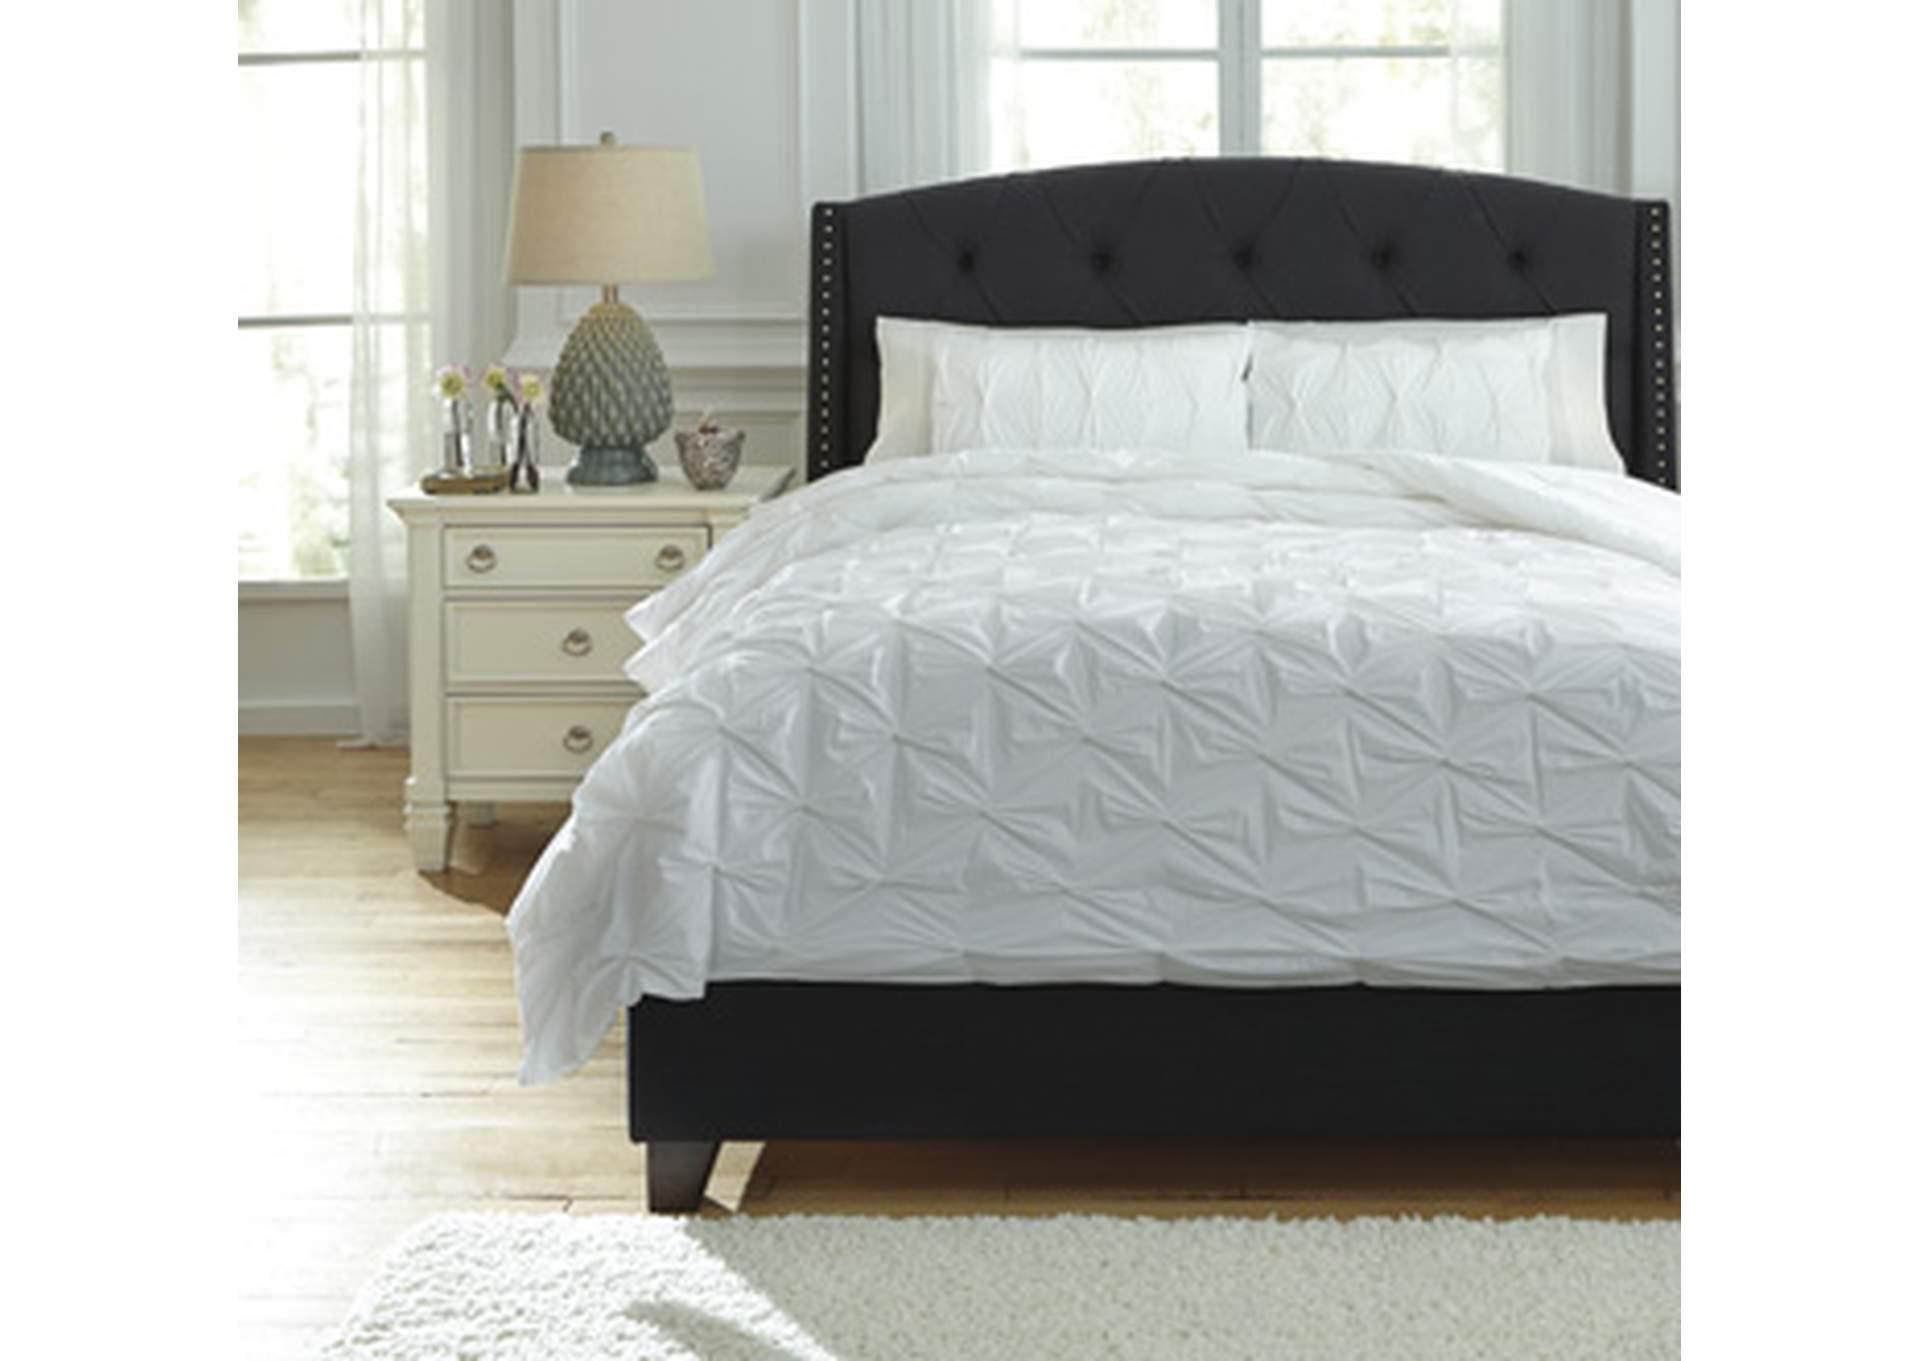 Rimy 3 Piece King Comforter Set